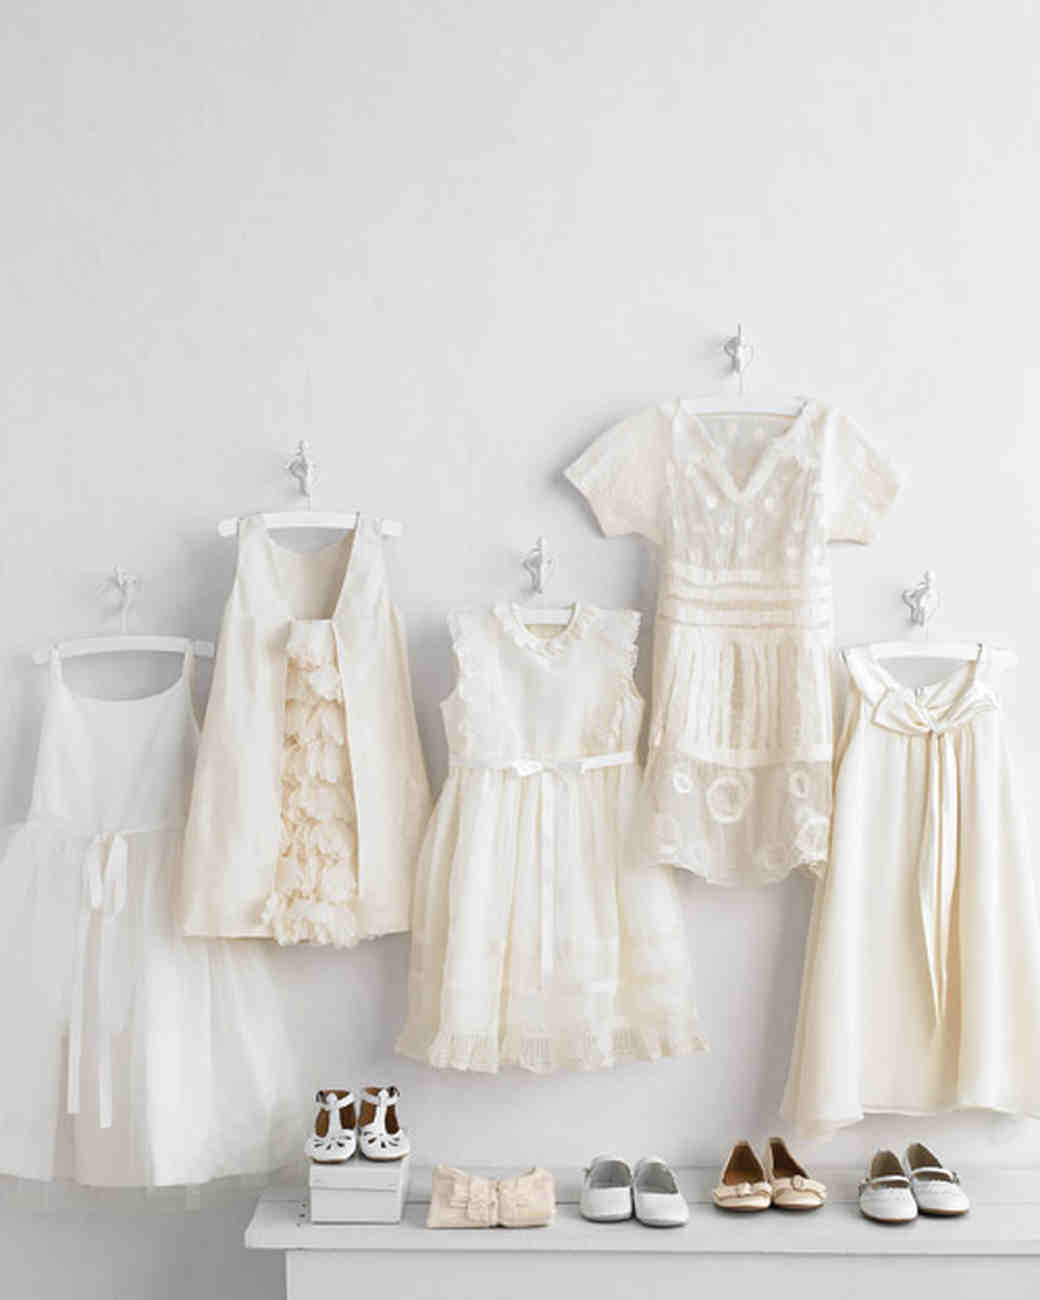 mw105137_0110_dresses1.jpg